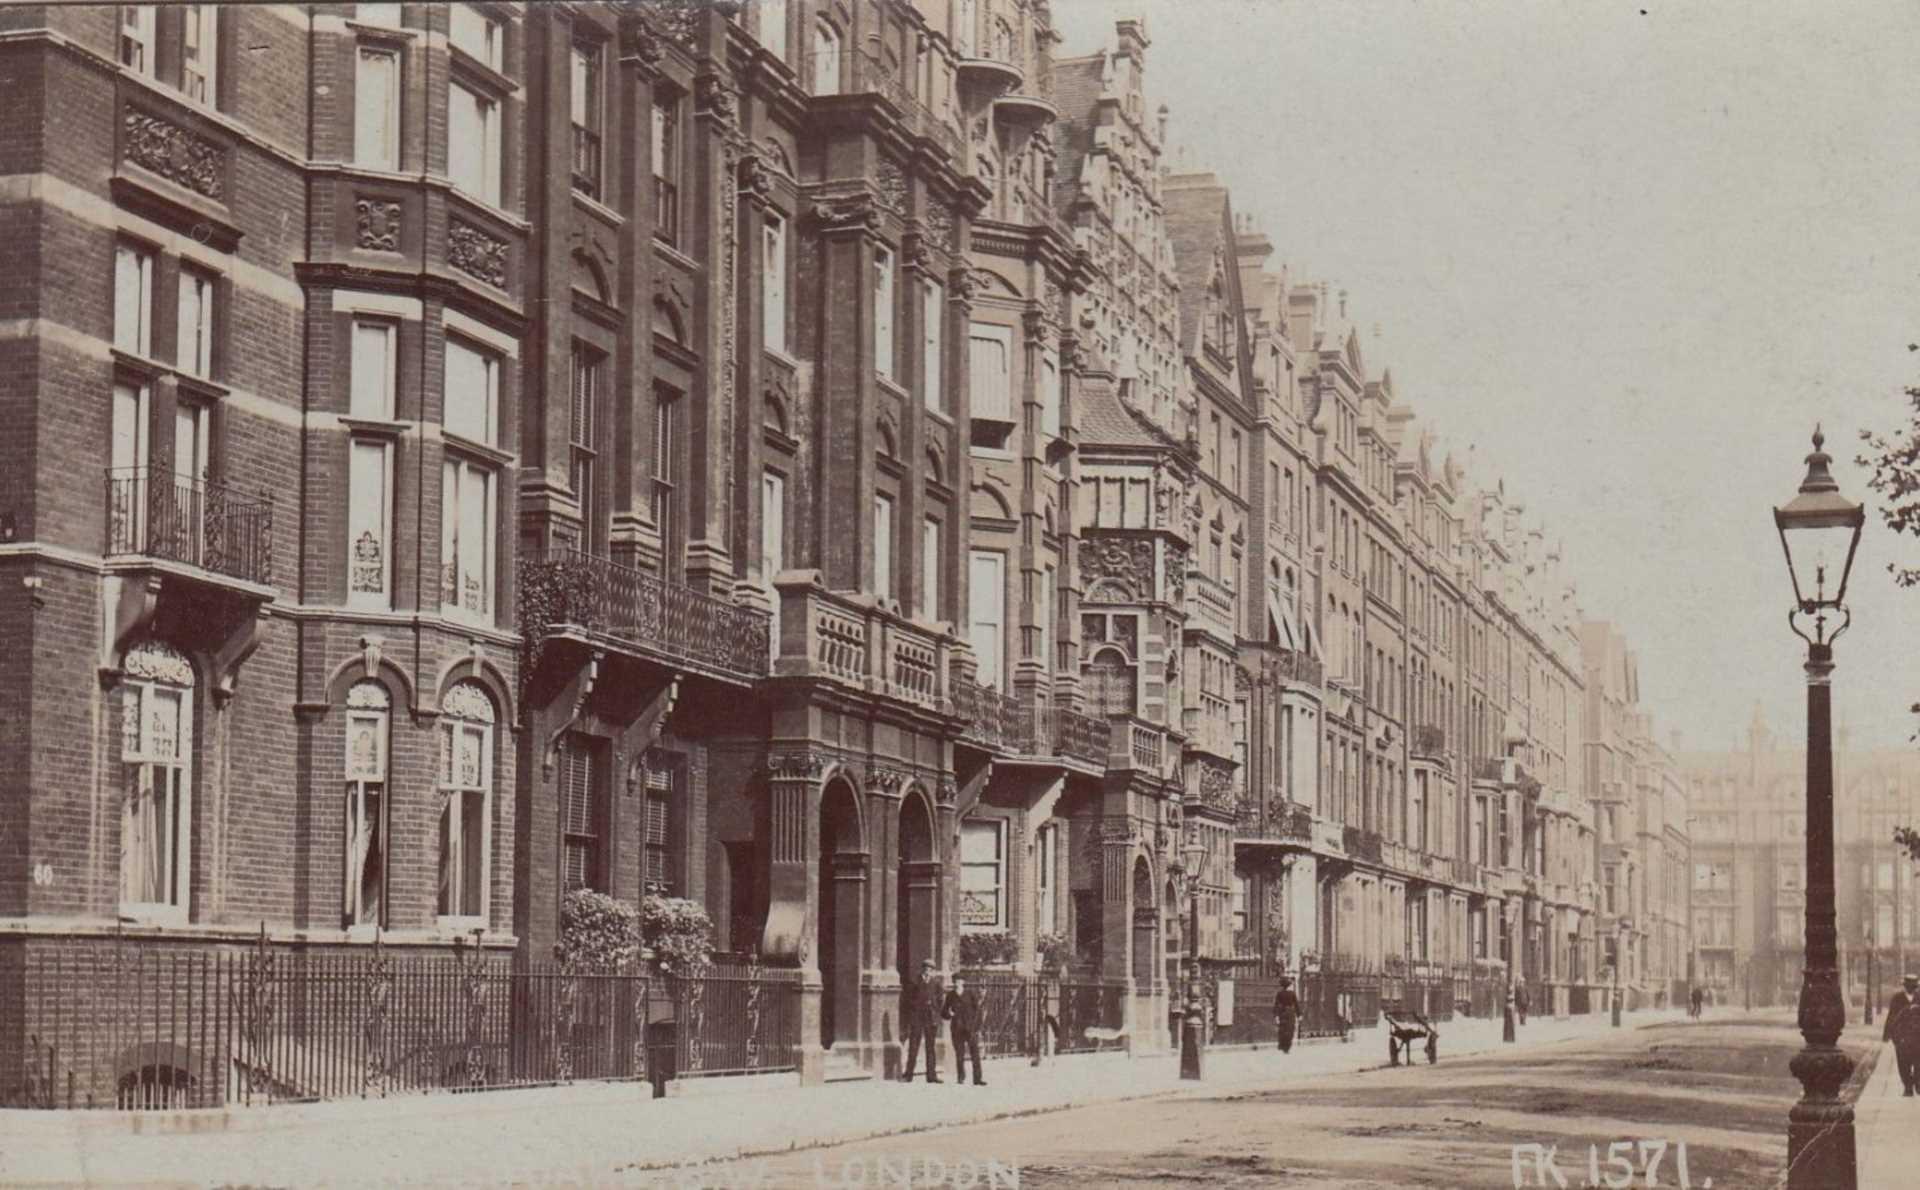 Cadogan Square, Knightsbridge, SW1X, Image 4